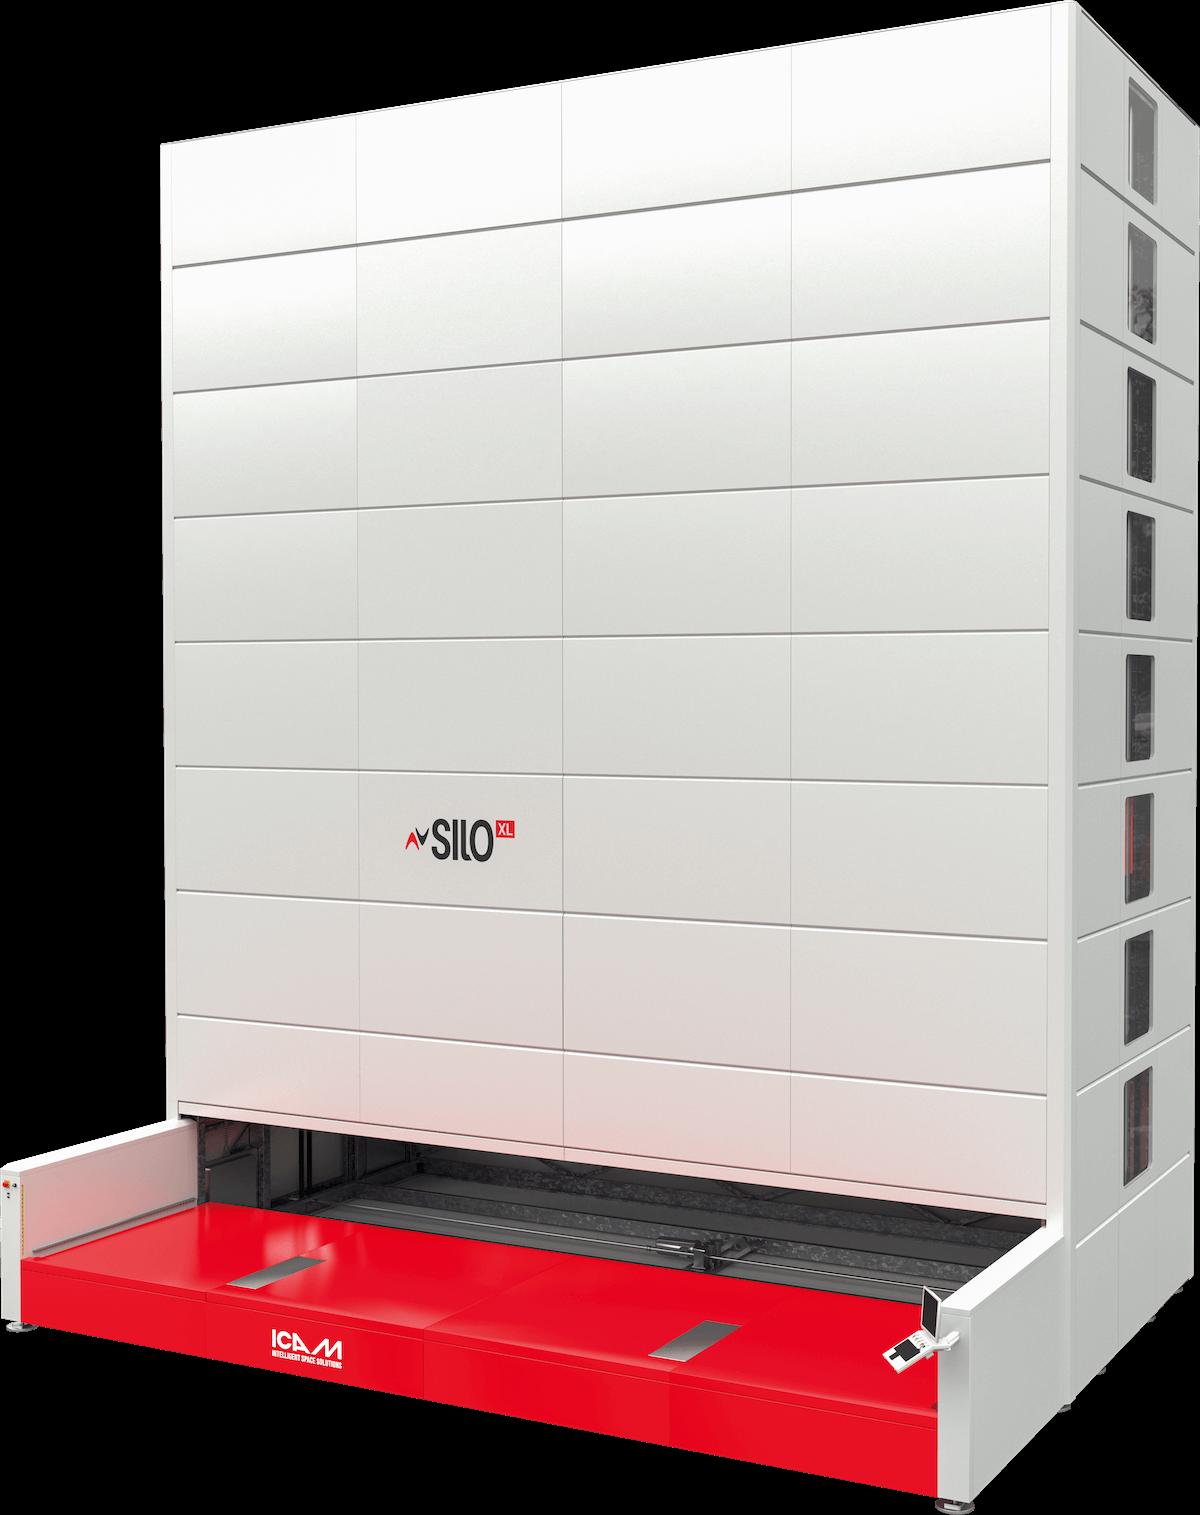 ICAM | Silo XL - Industrial